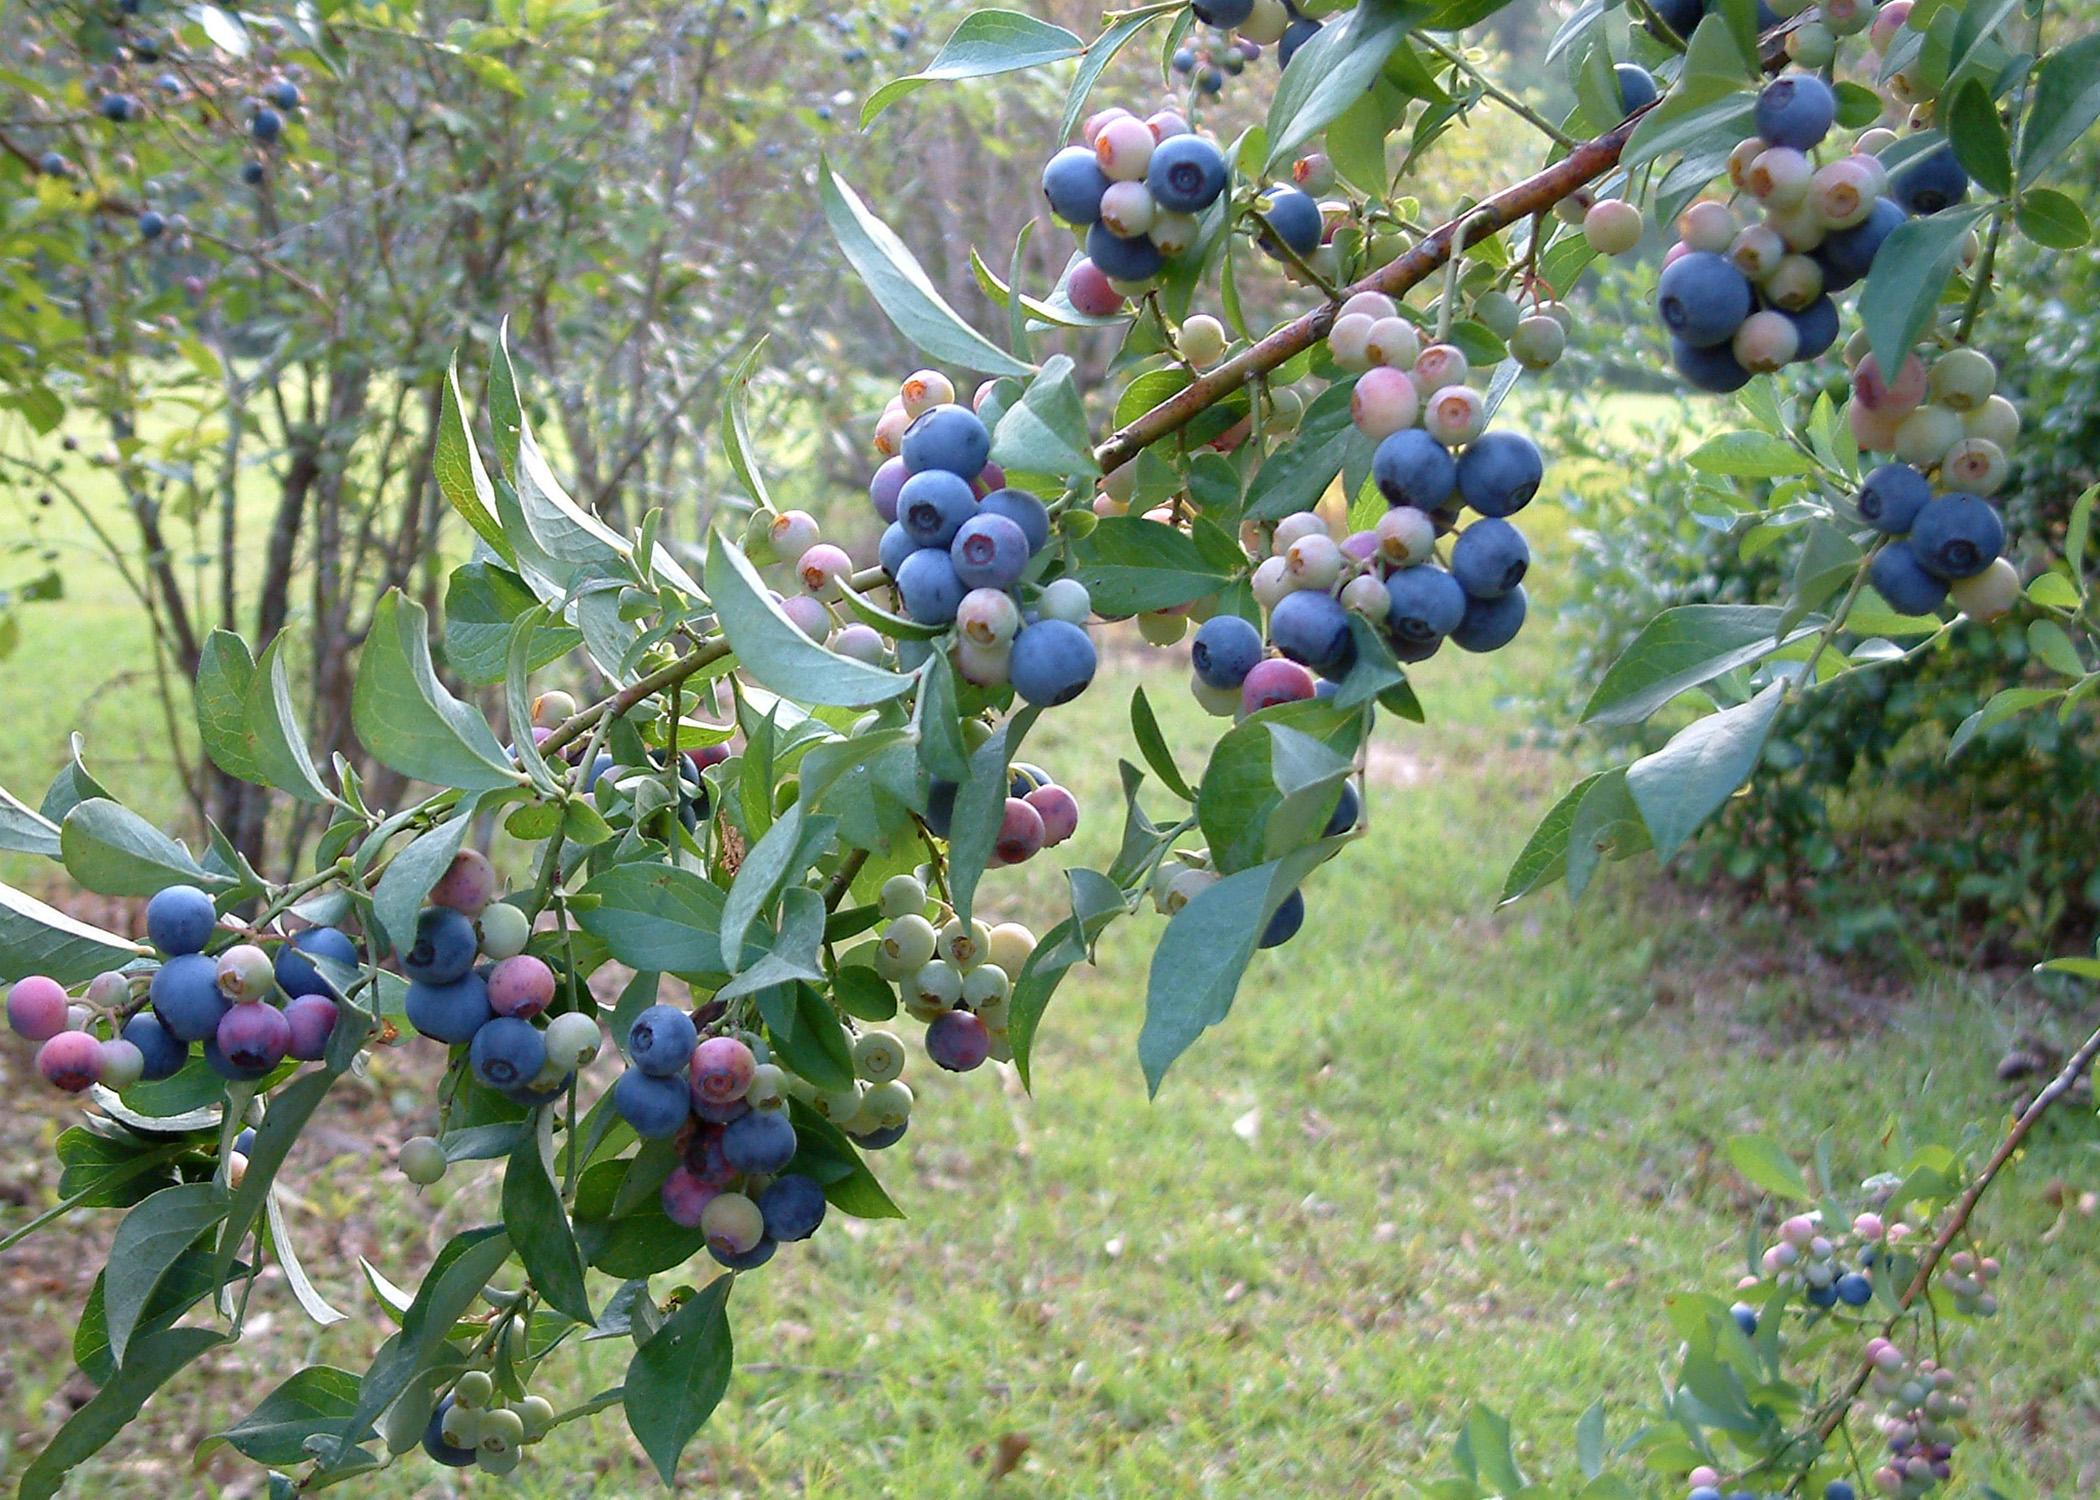 Dry weather speeds blueberry harvest | Mississippi State ...